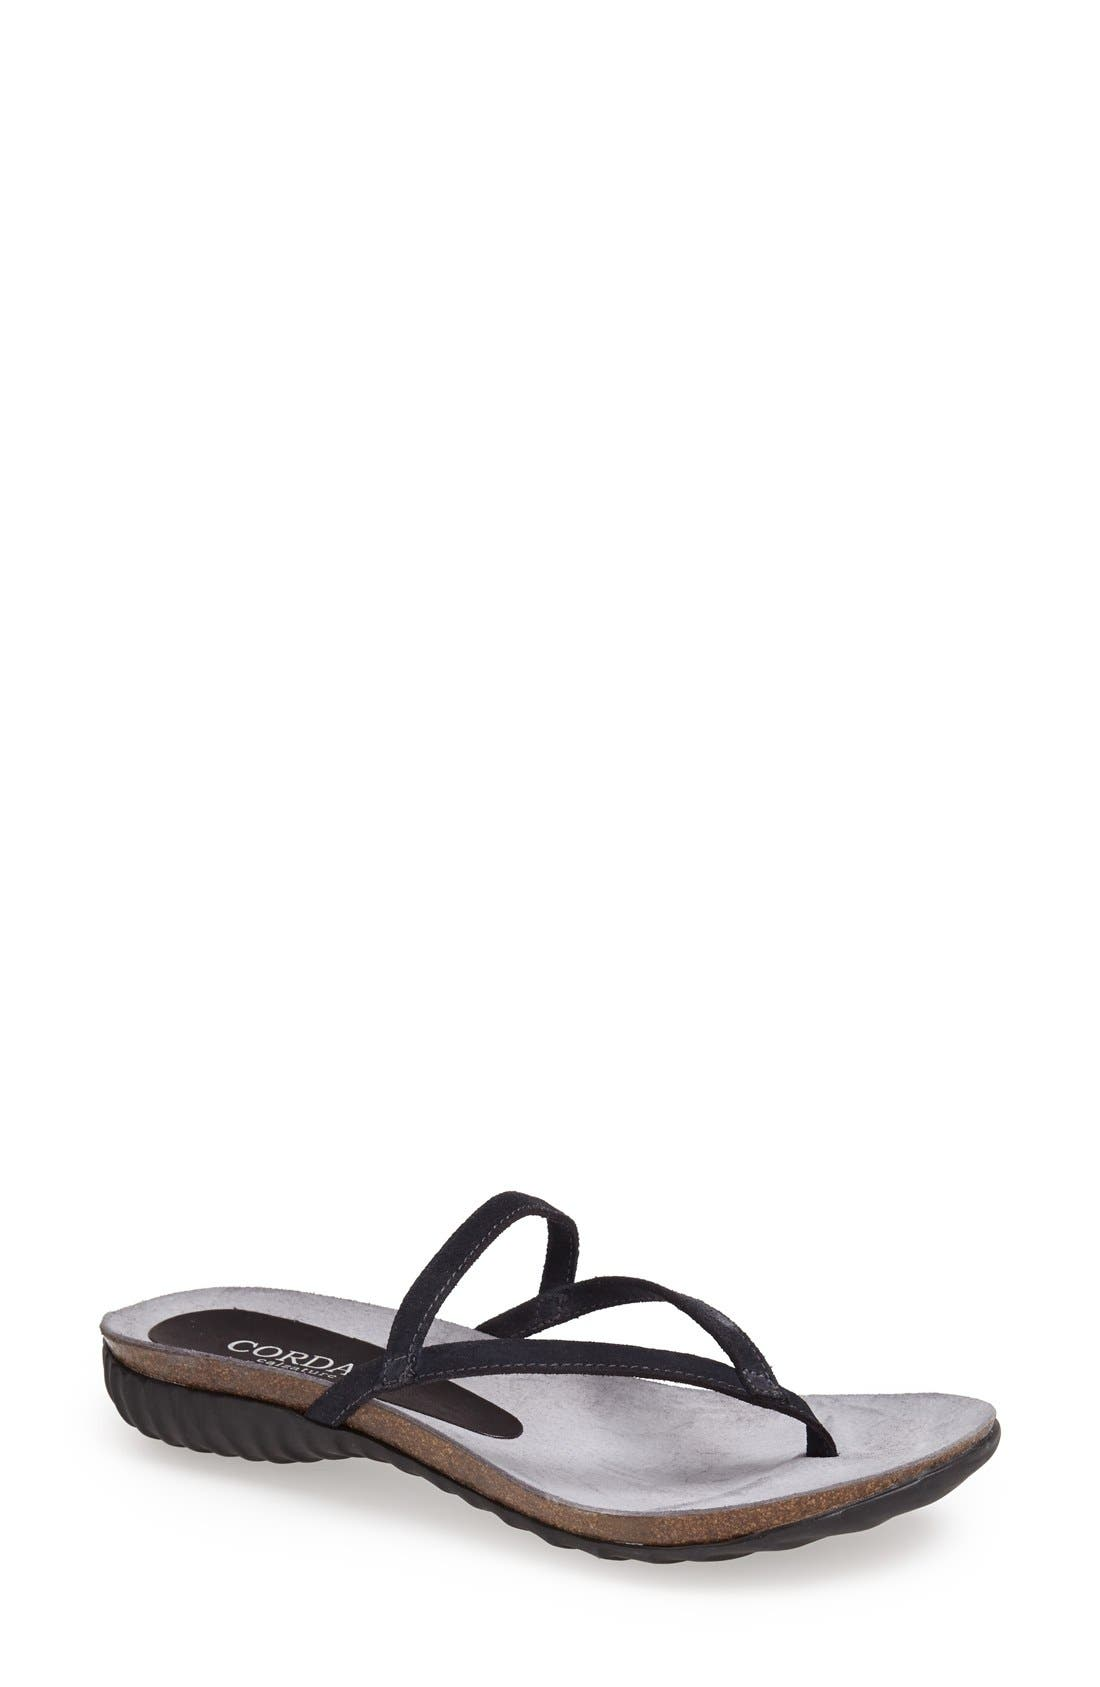 Main Image - Cordani 'Muri' Sandal